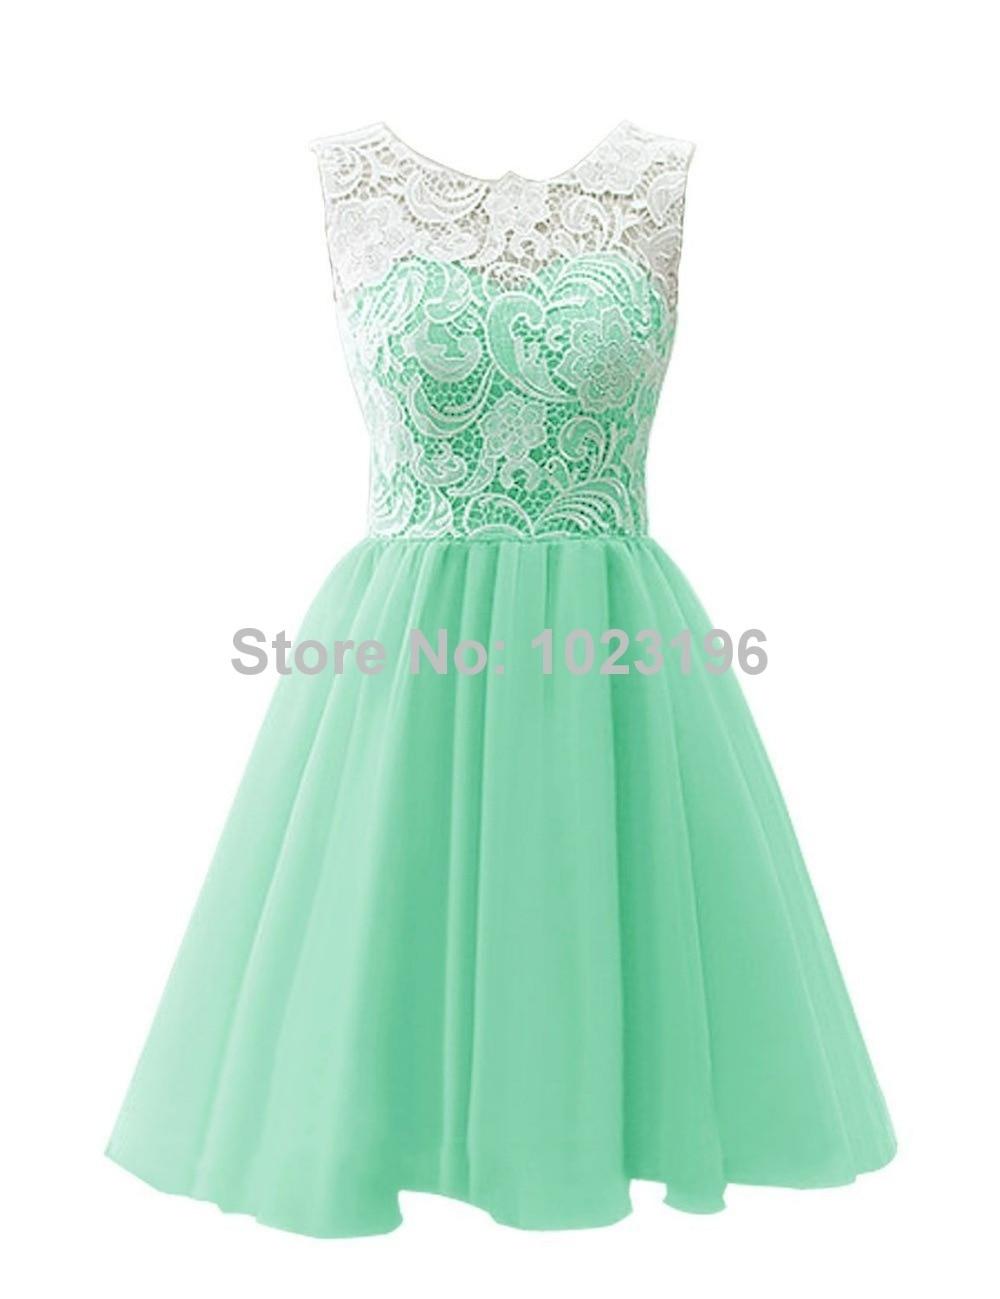 Green Lace Short Formal Dresses – fashion dresses